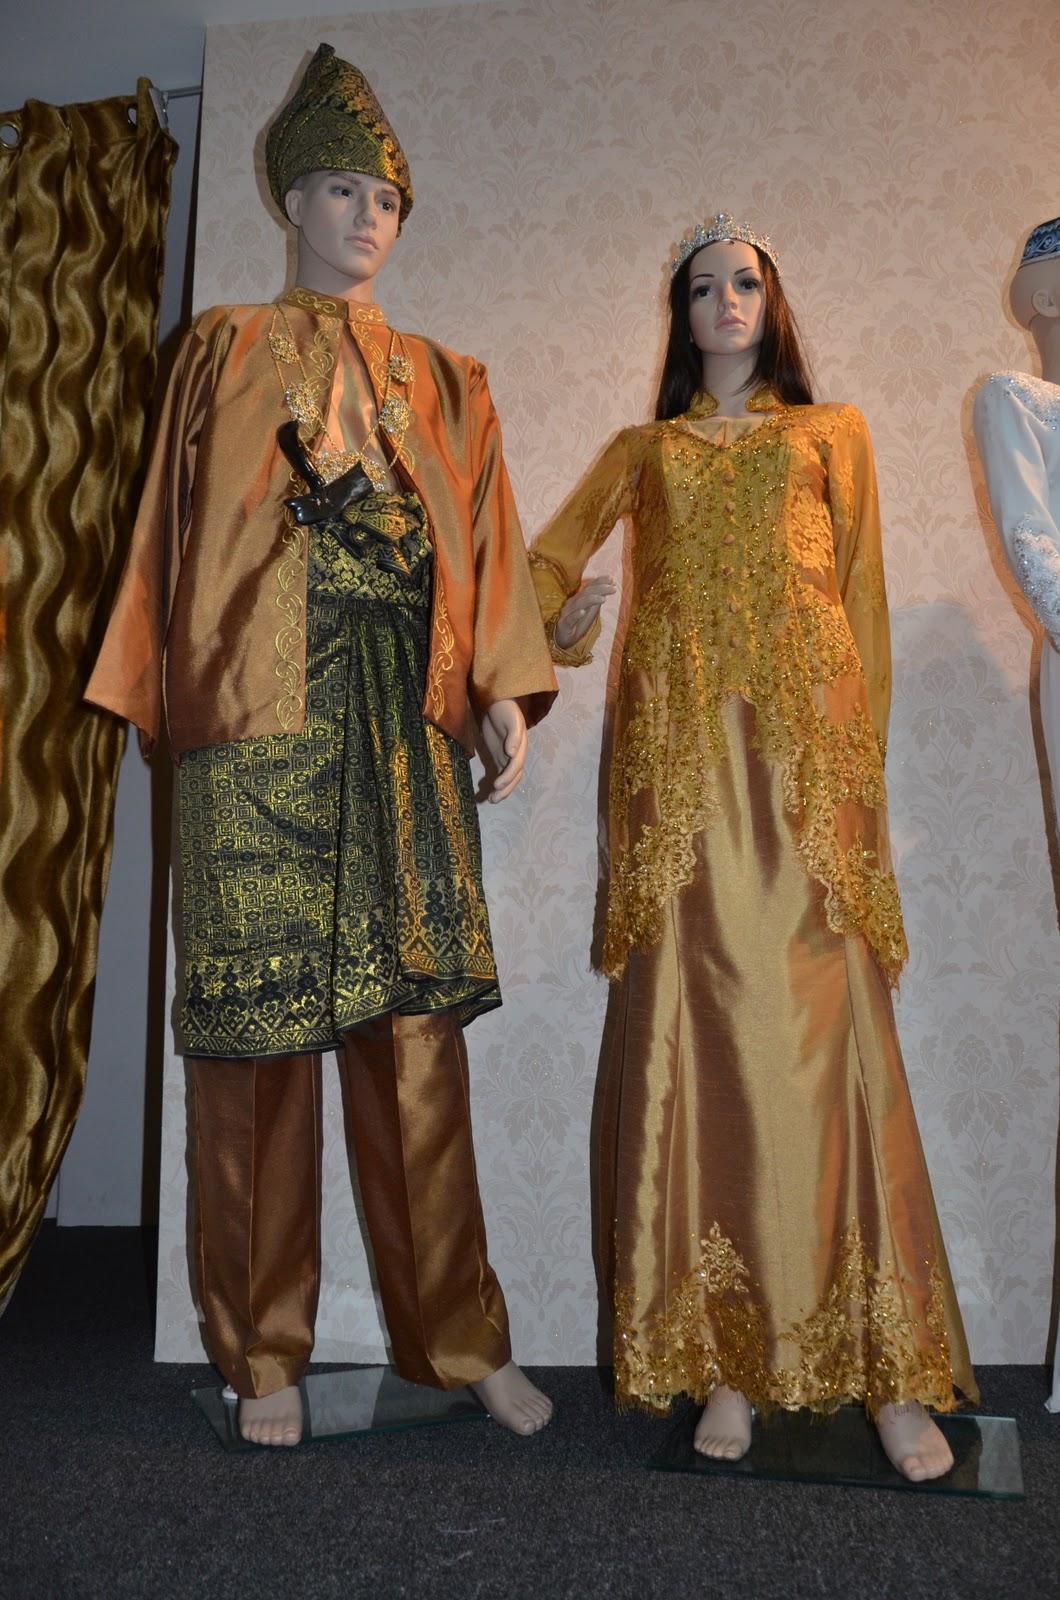 Baju Pengantin 2012 Prom Dresses 2012 And 2012 Formal Gowns